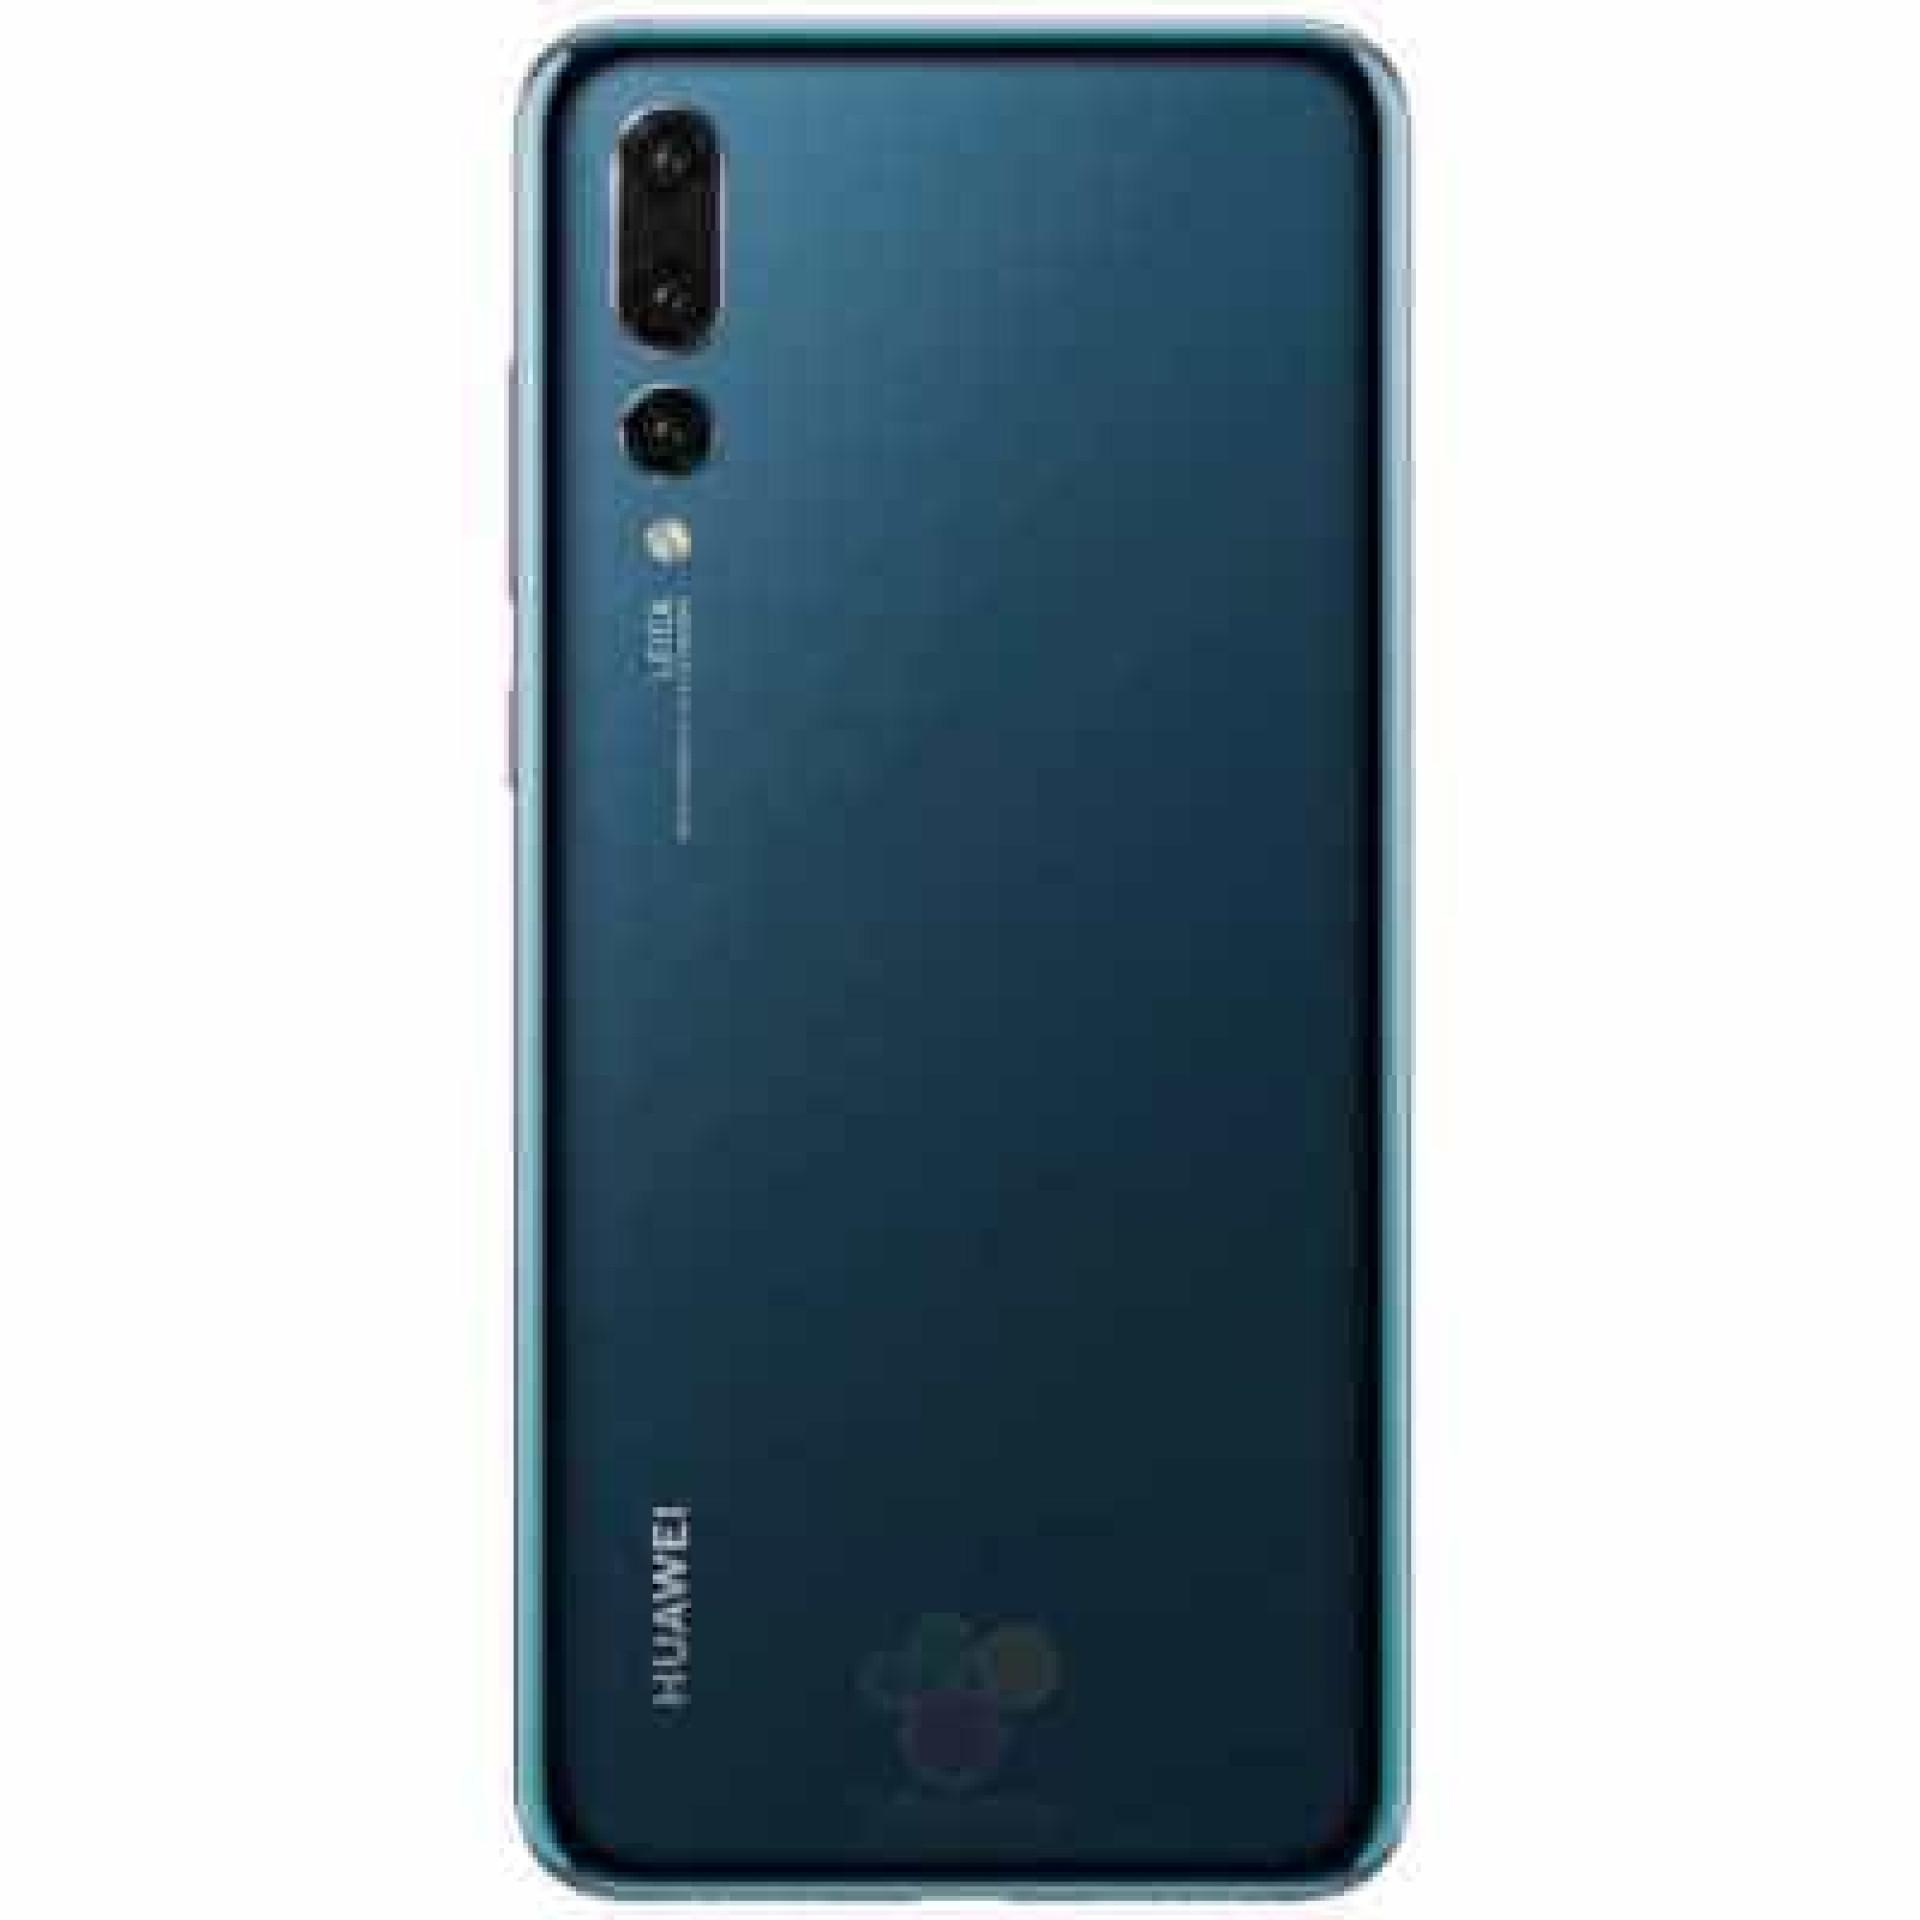 O próximo smartphone da Huawei pode ter cores nunca antes vistas